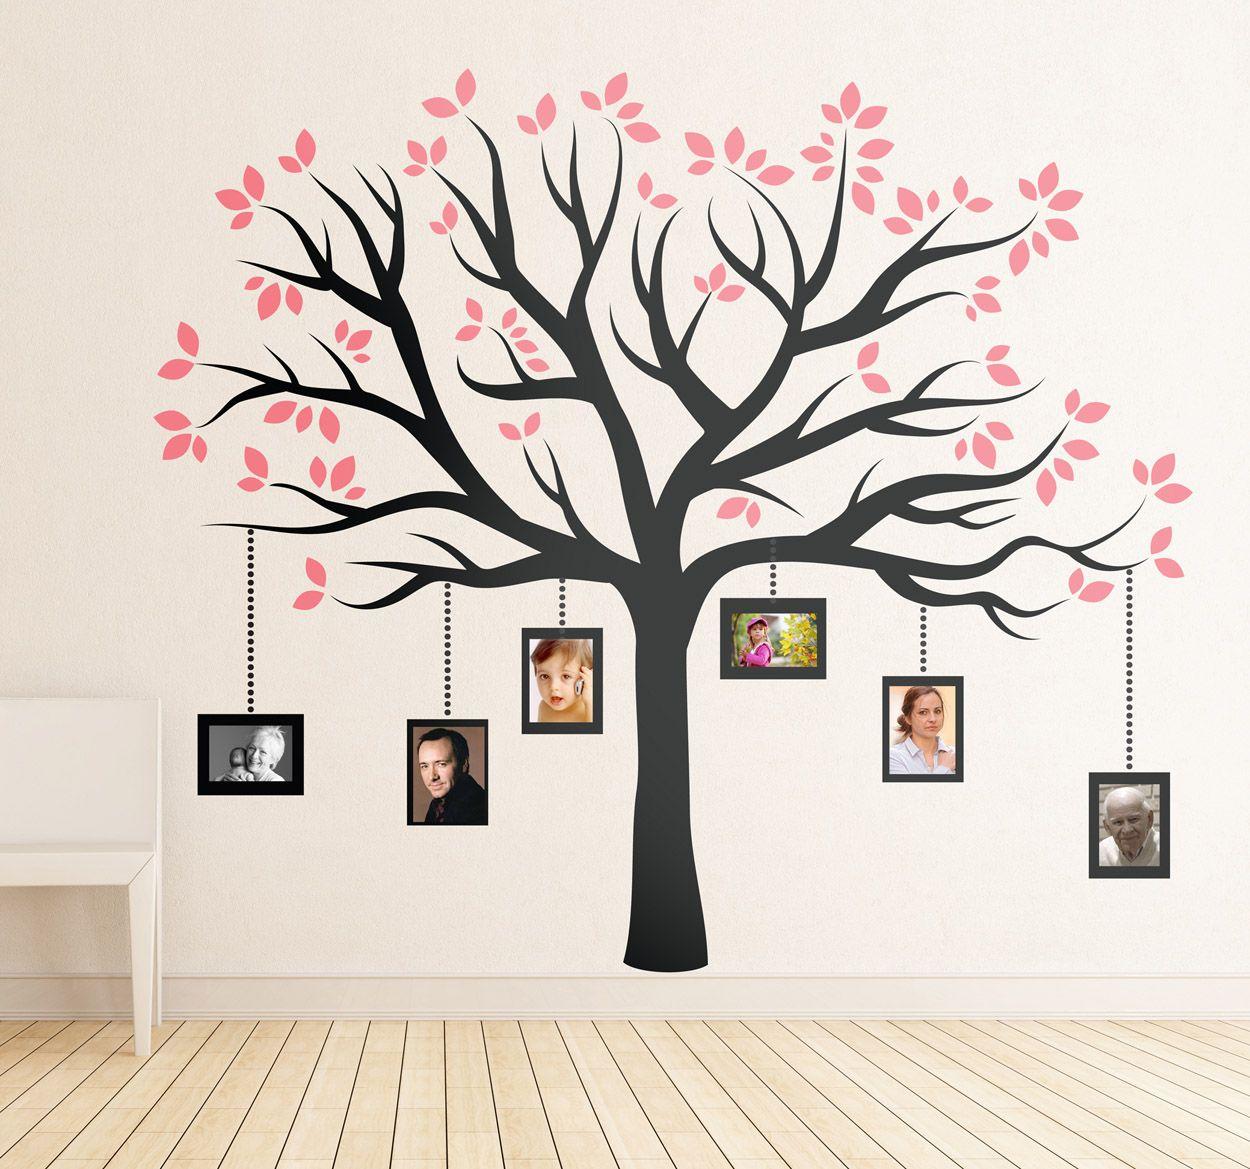 Vinilo decorativo marcos árbol familiar | Painted walls | Pinterest ...